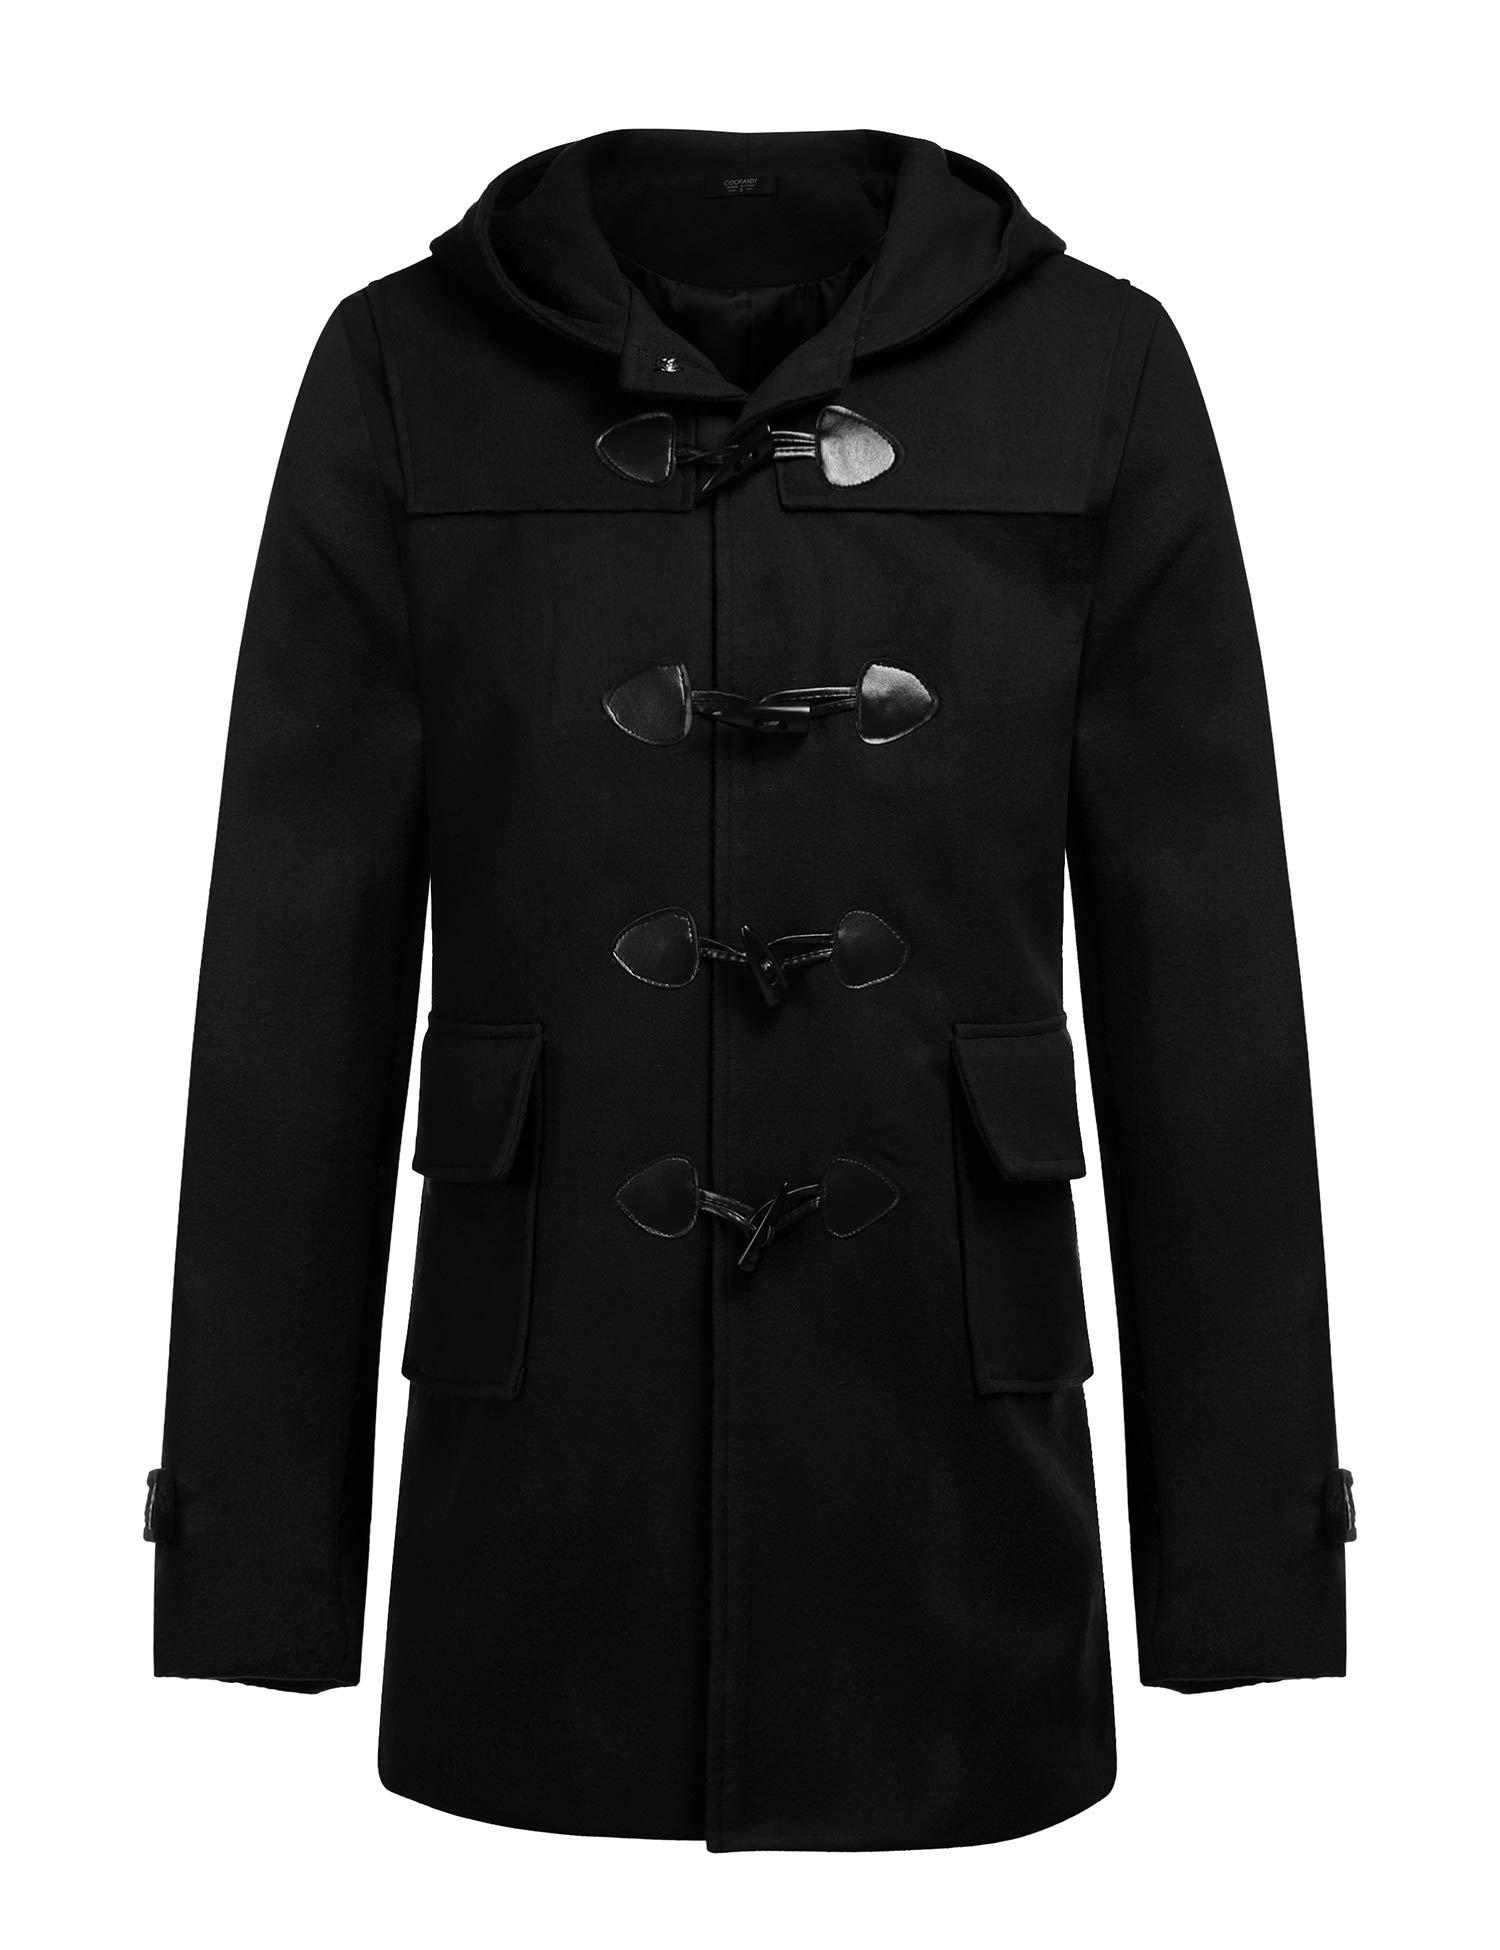 COOFANDY Mens Winter Slim Fit Mid Long Coat Jacket Horn Buckle Trench Overcoat Black by COOFANDY